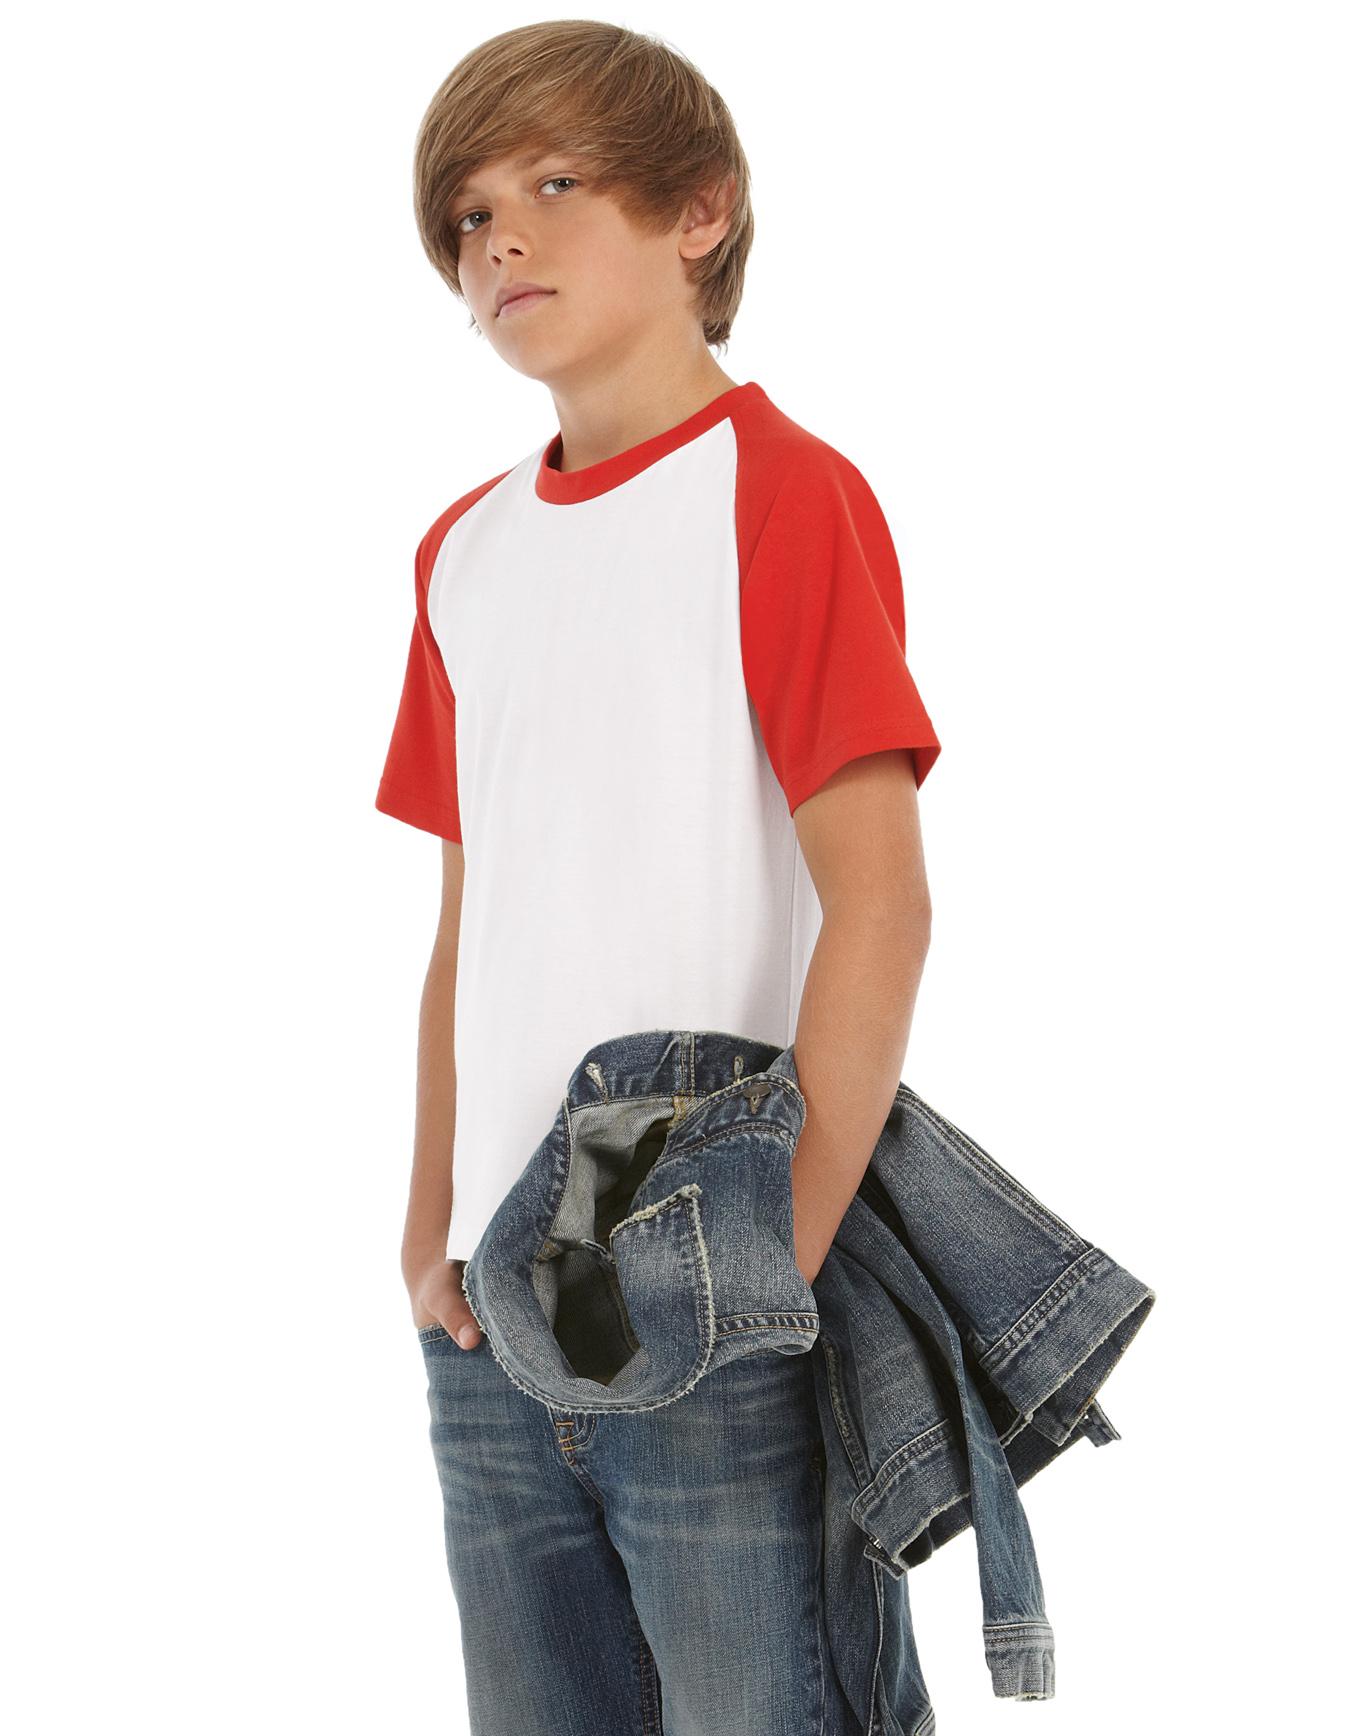 B&C Baseball Kids T-shirt